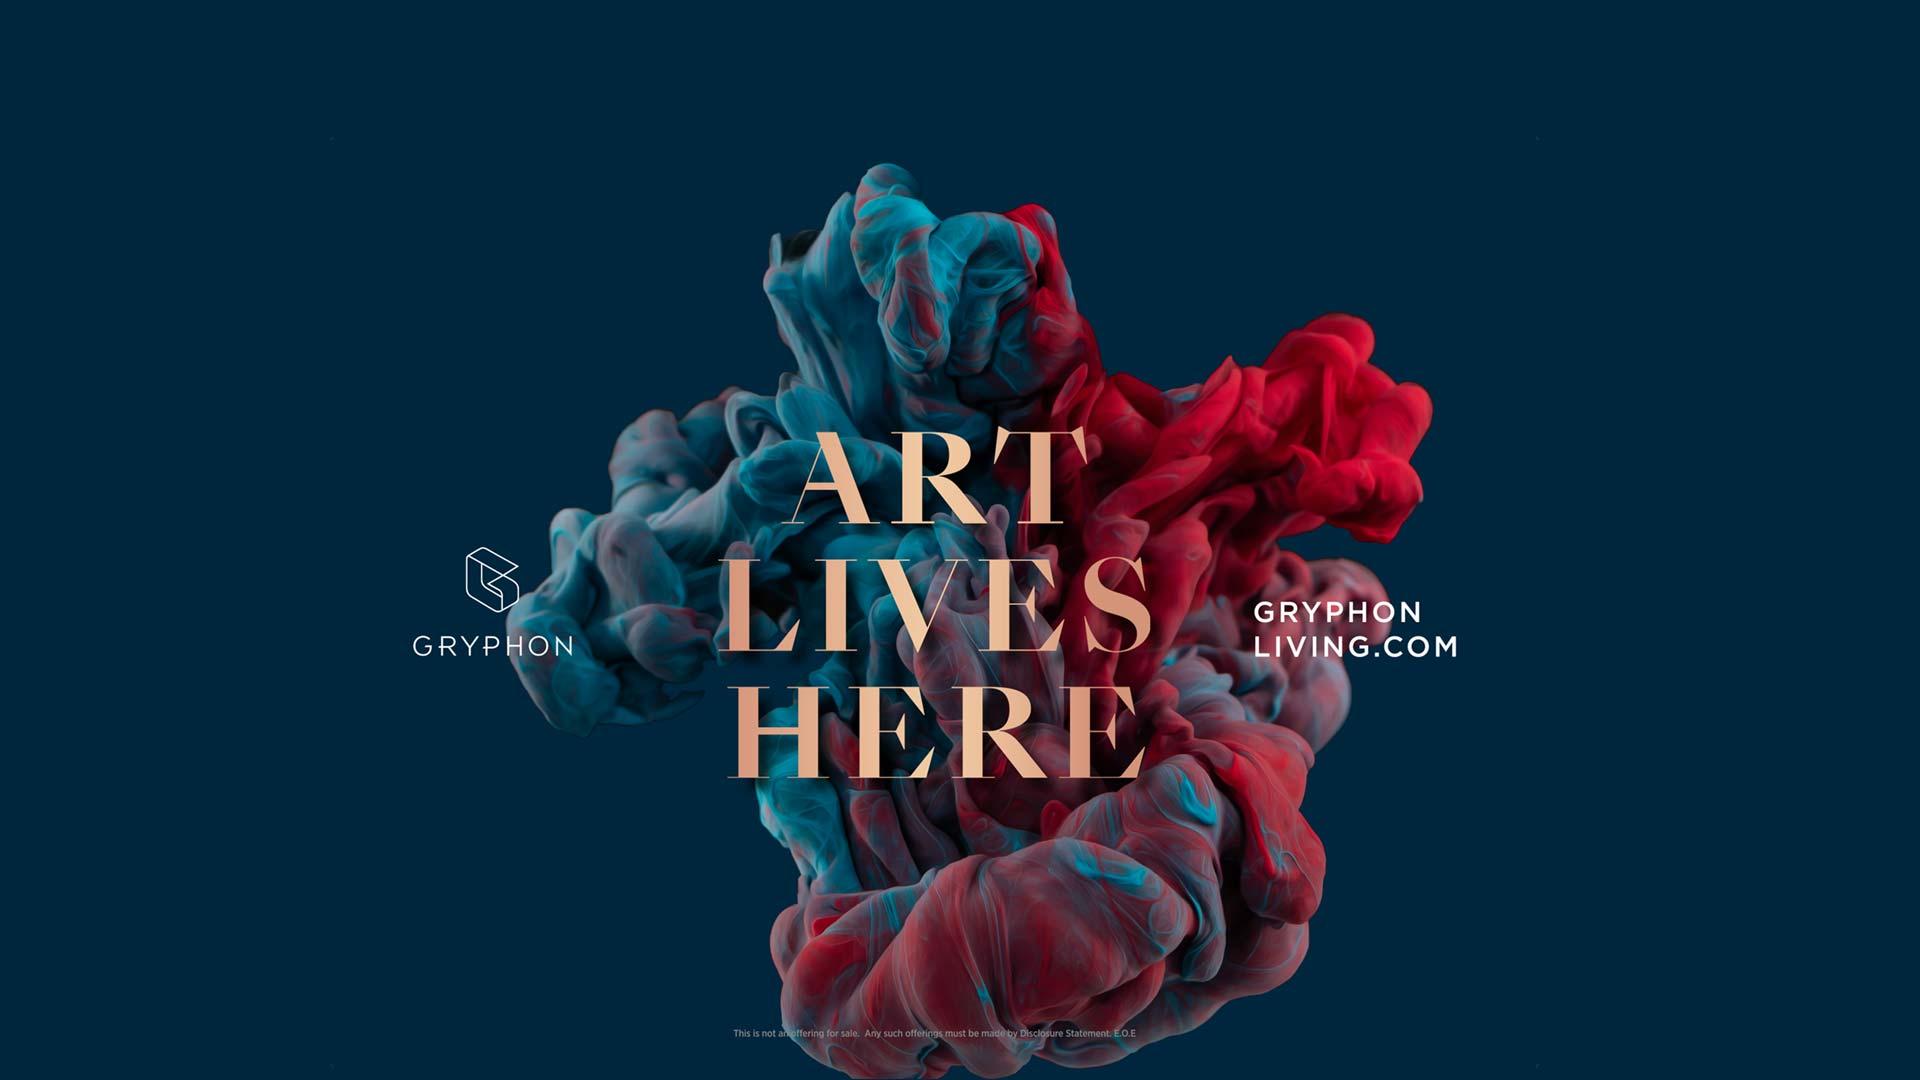 Art Lives Here Gryphon Development